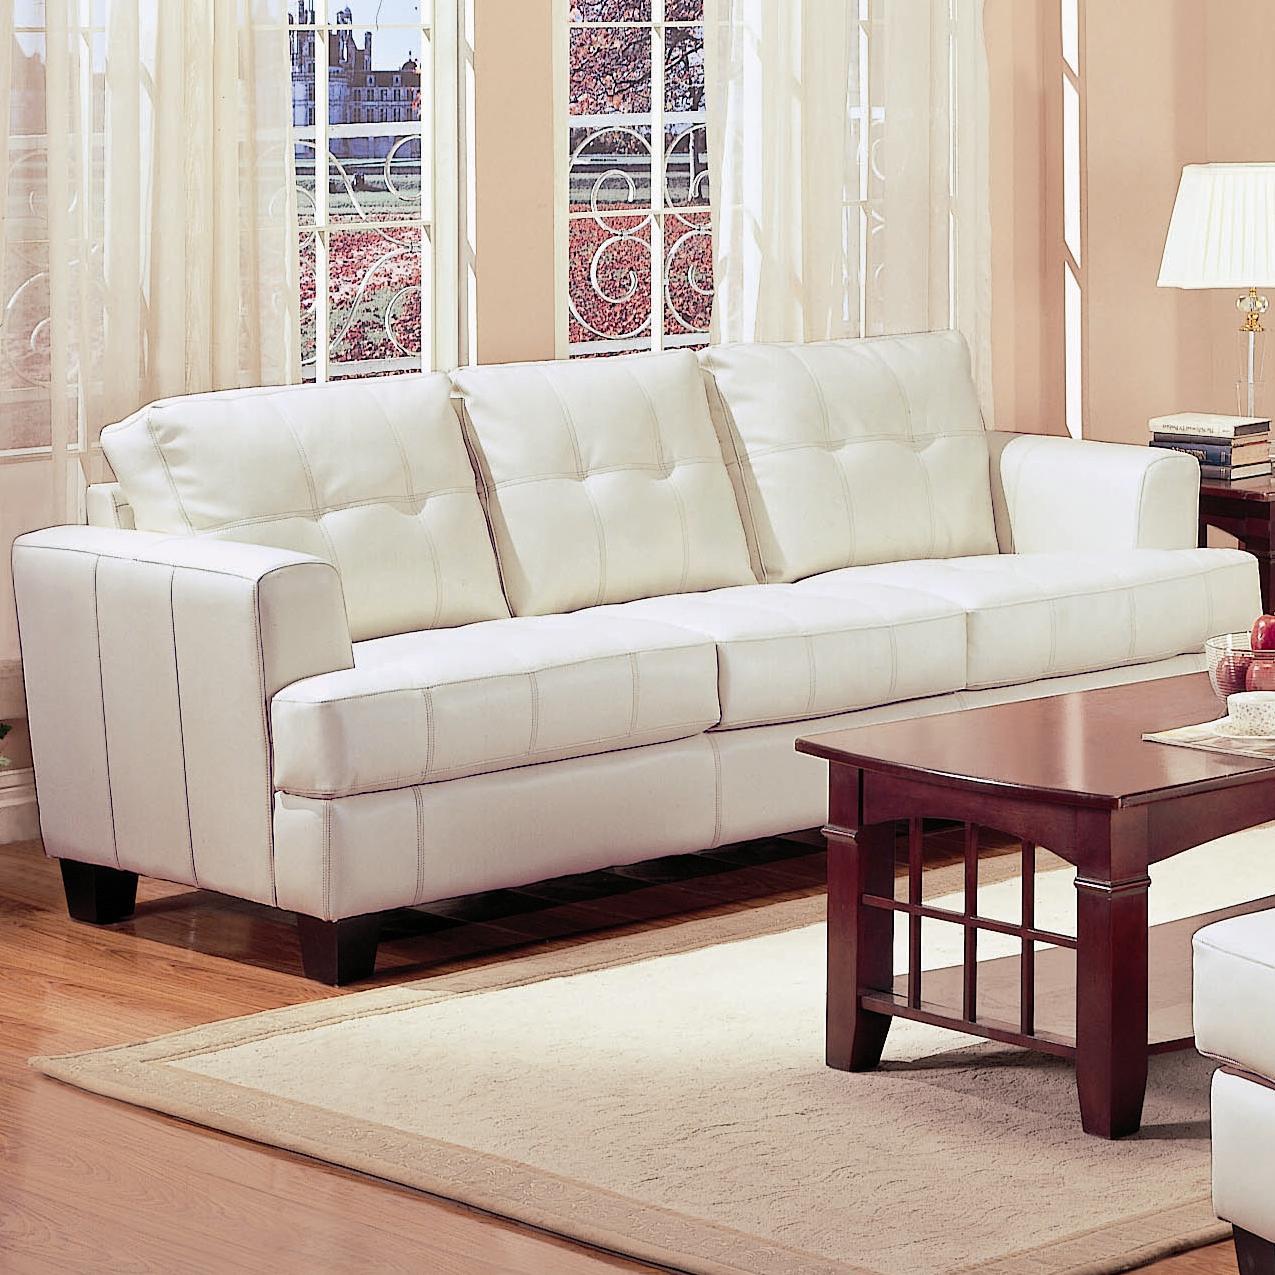 sleeper-sofa-austin-tx-photo-10